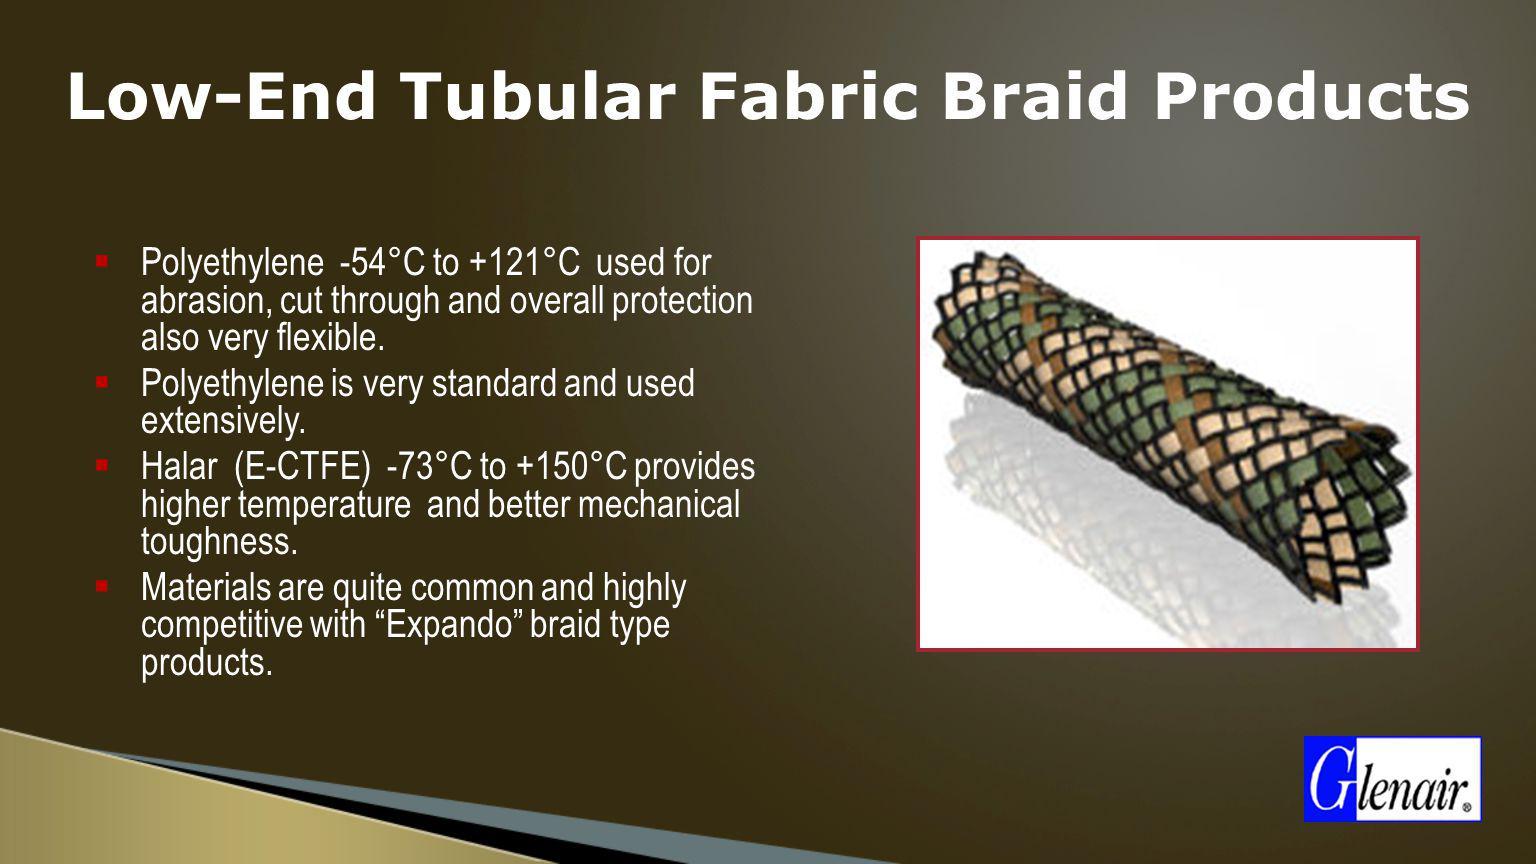 Low-End Tubular Fabric Braid Products